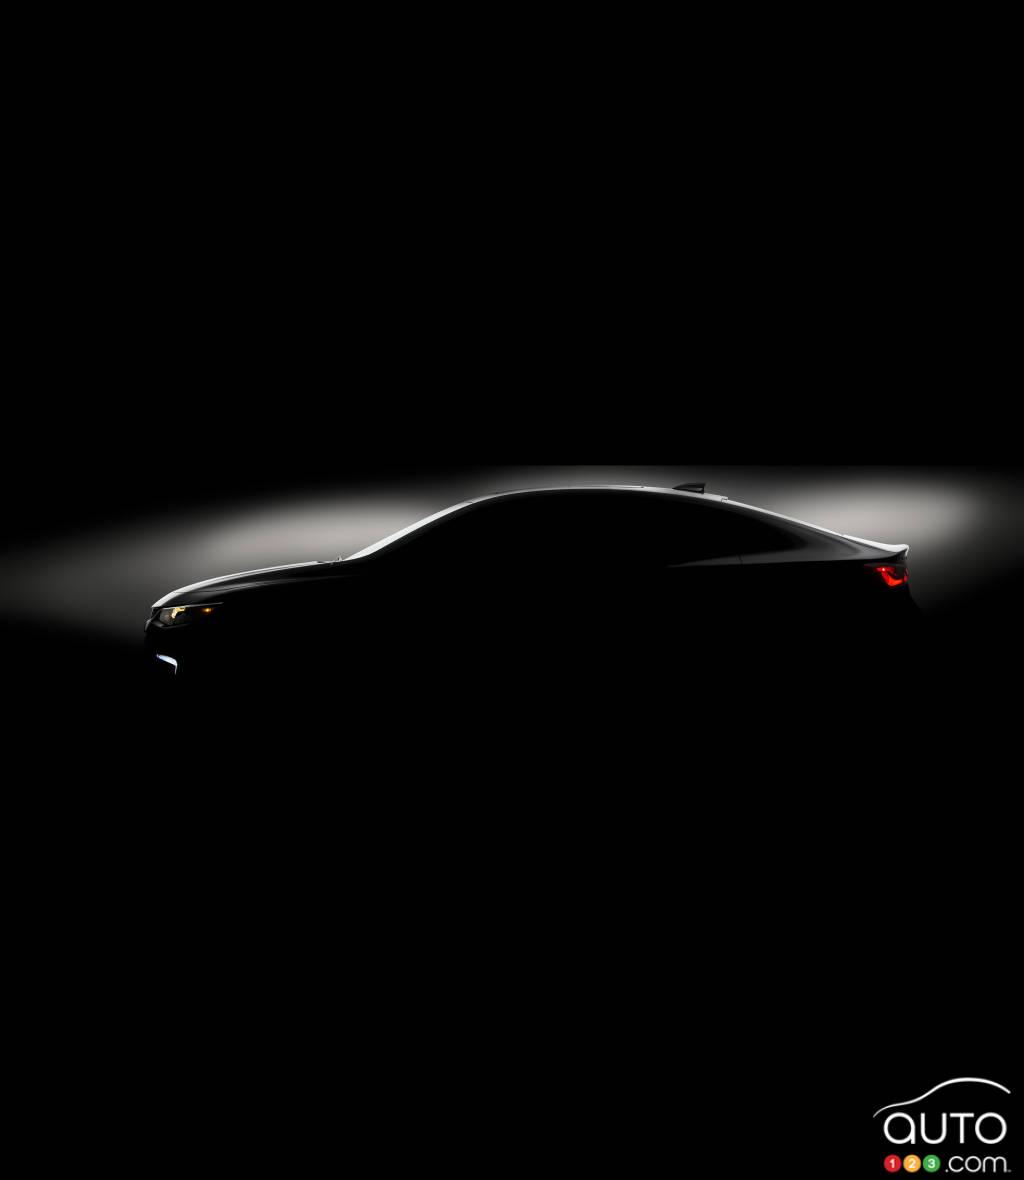 2015 New York Auto Show: Chevrolet to unveil redesigned 2016 Malibu